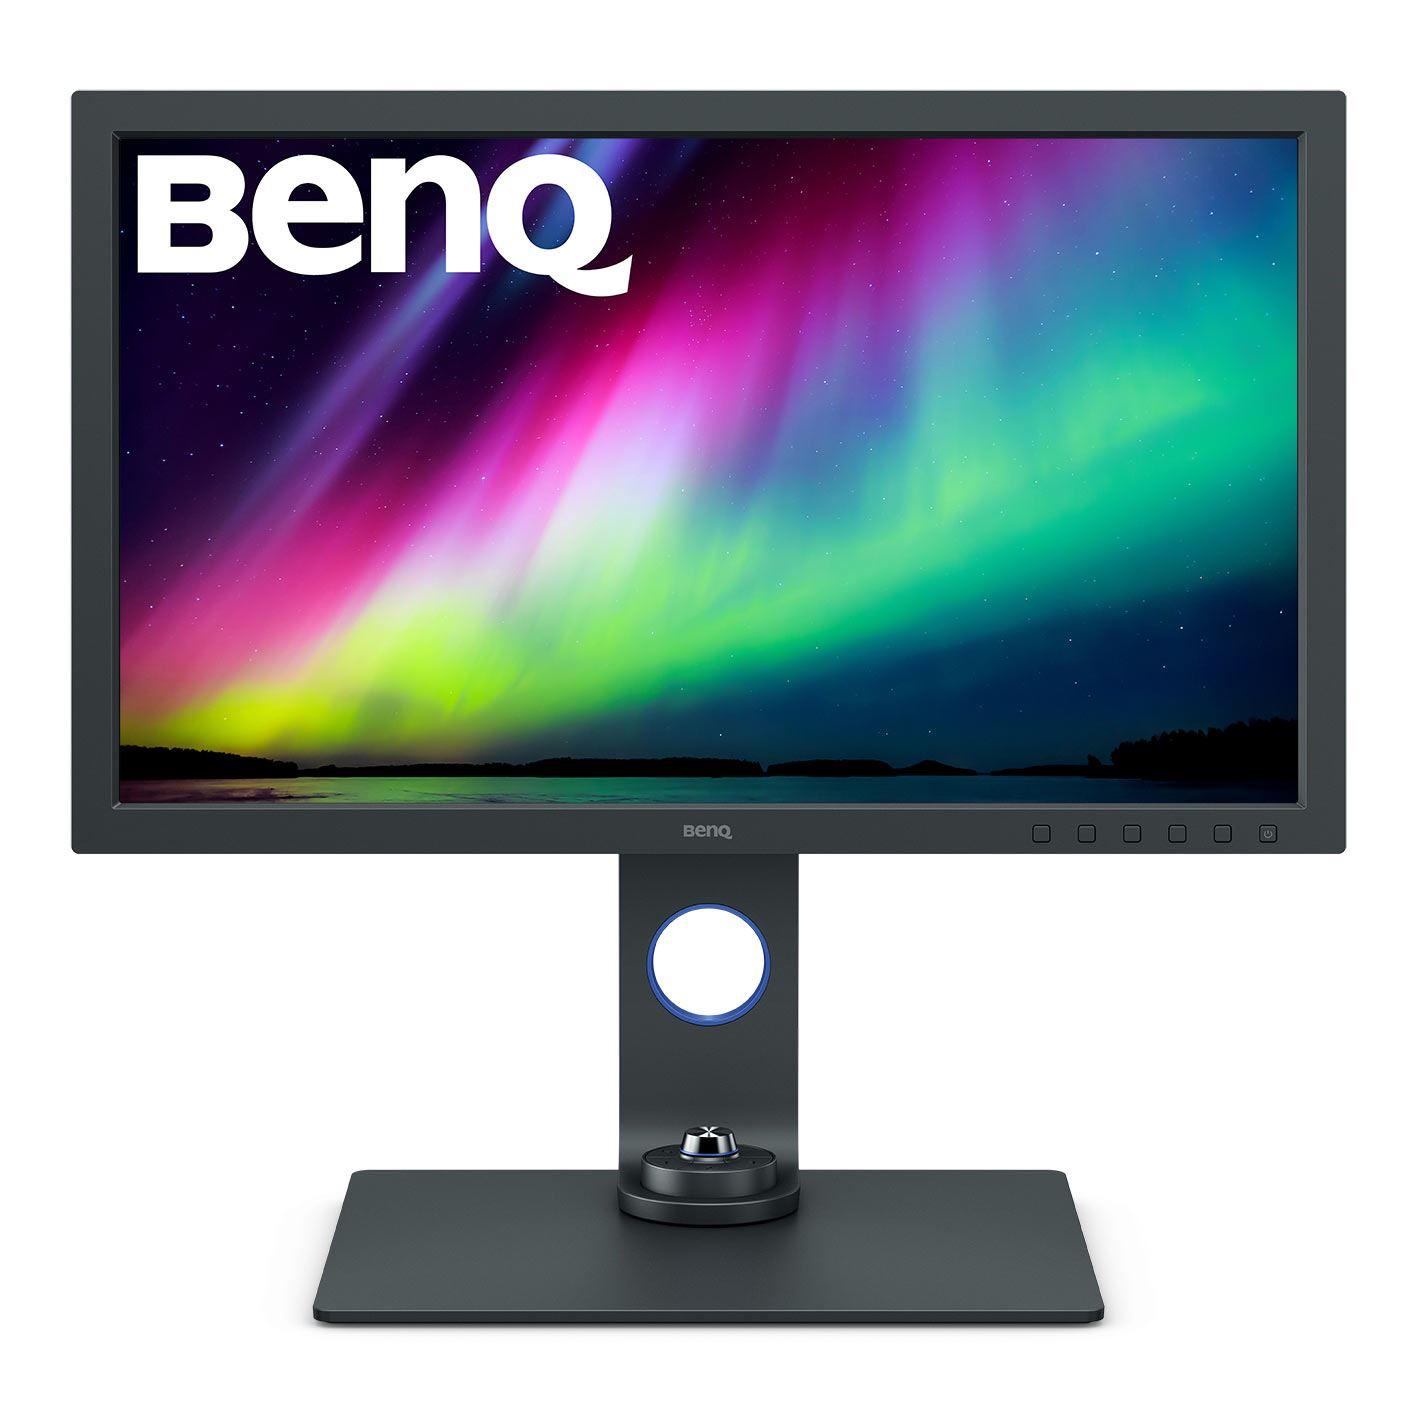 Image of BenQ SW271C Pro 27 Inch IPS Monitor